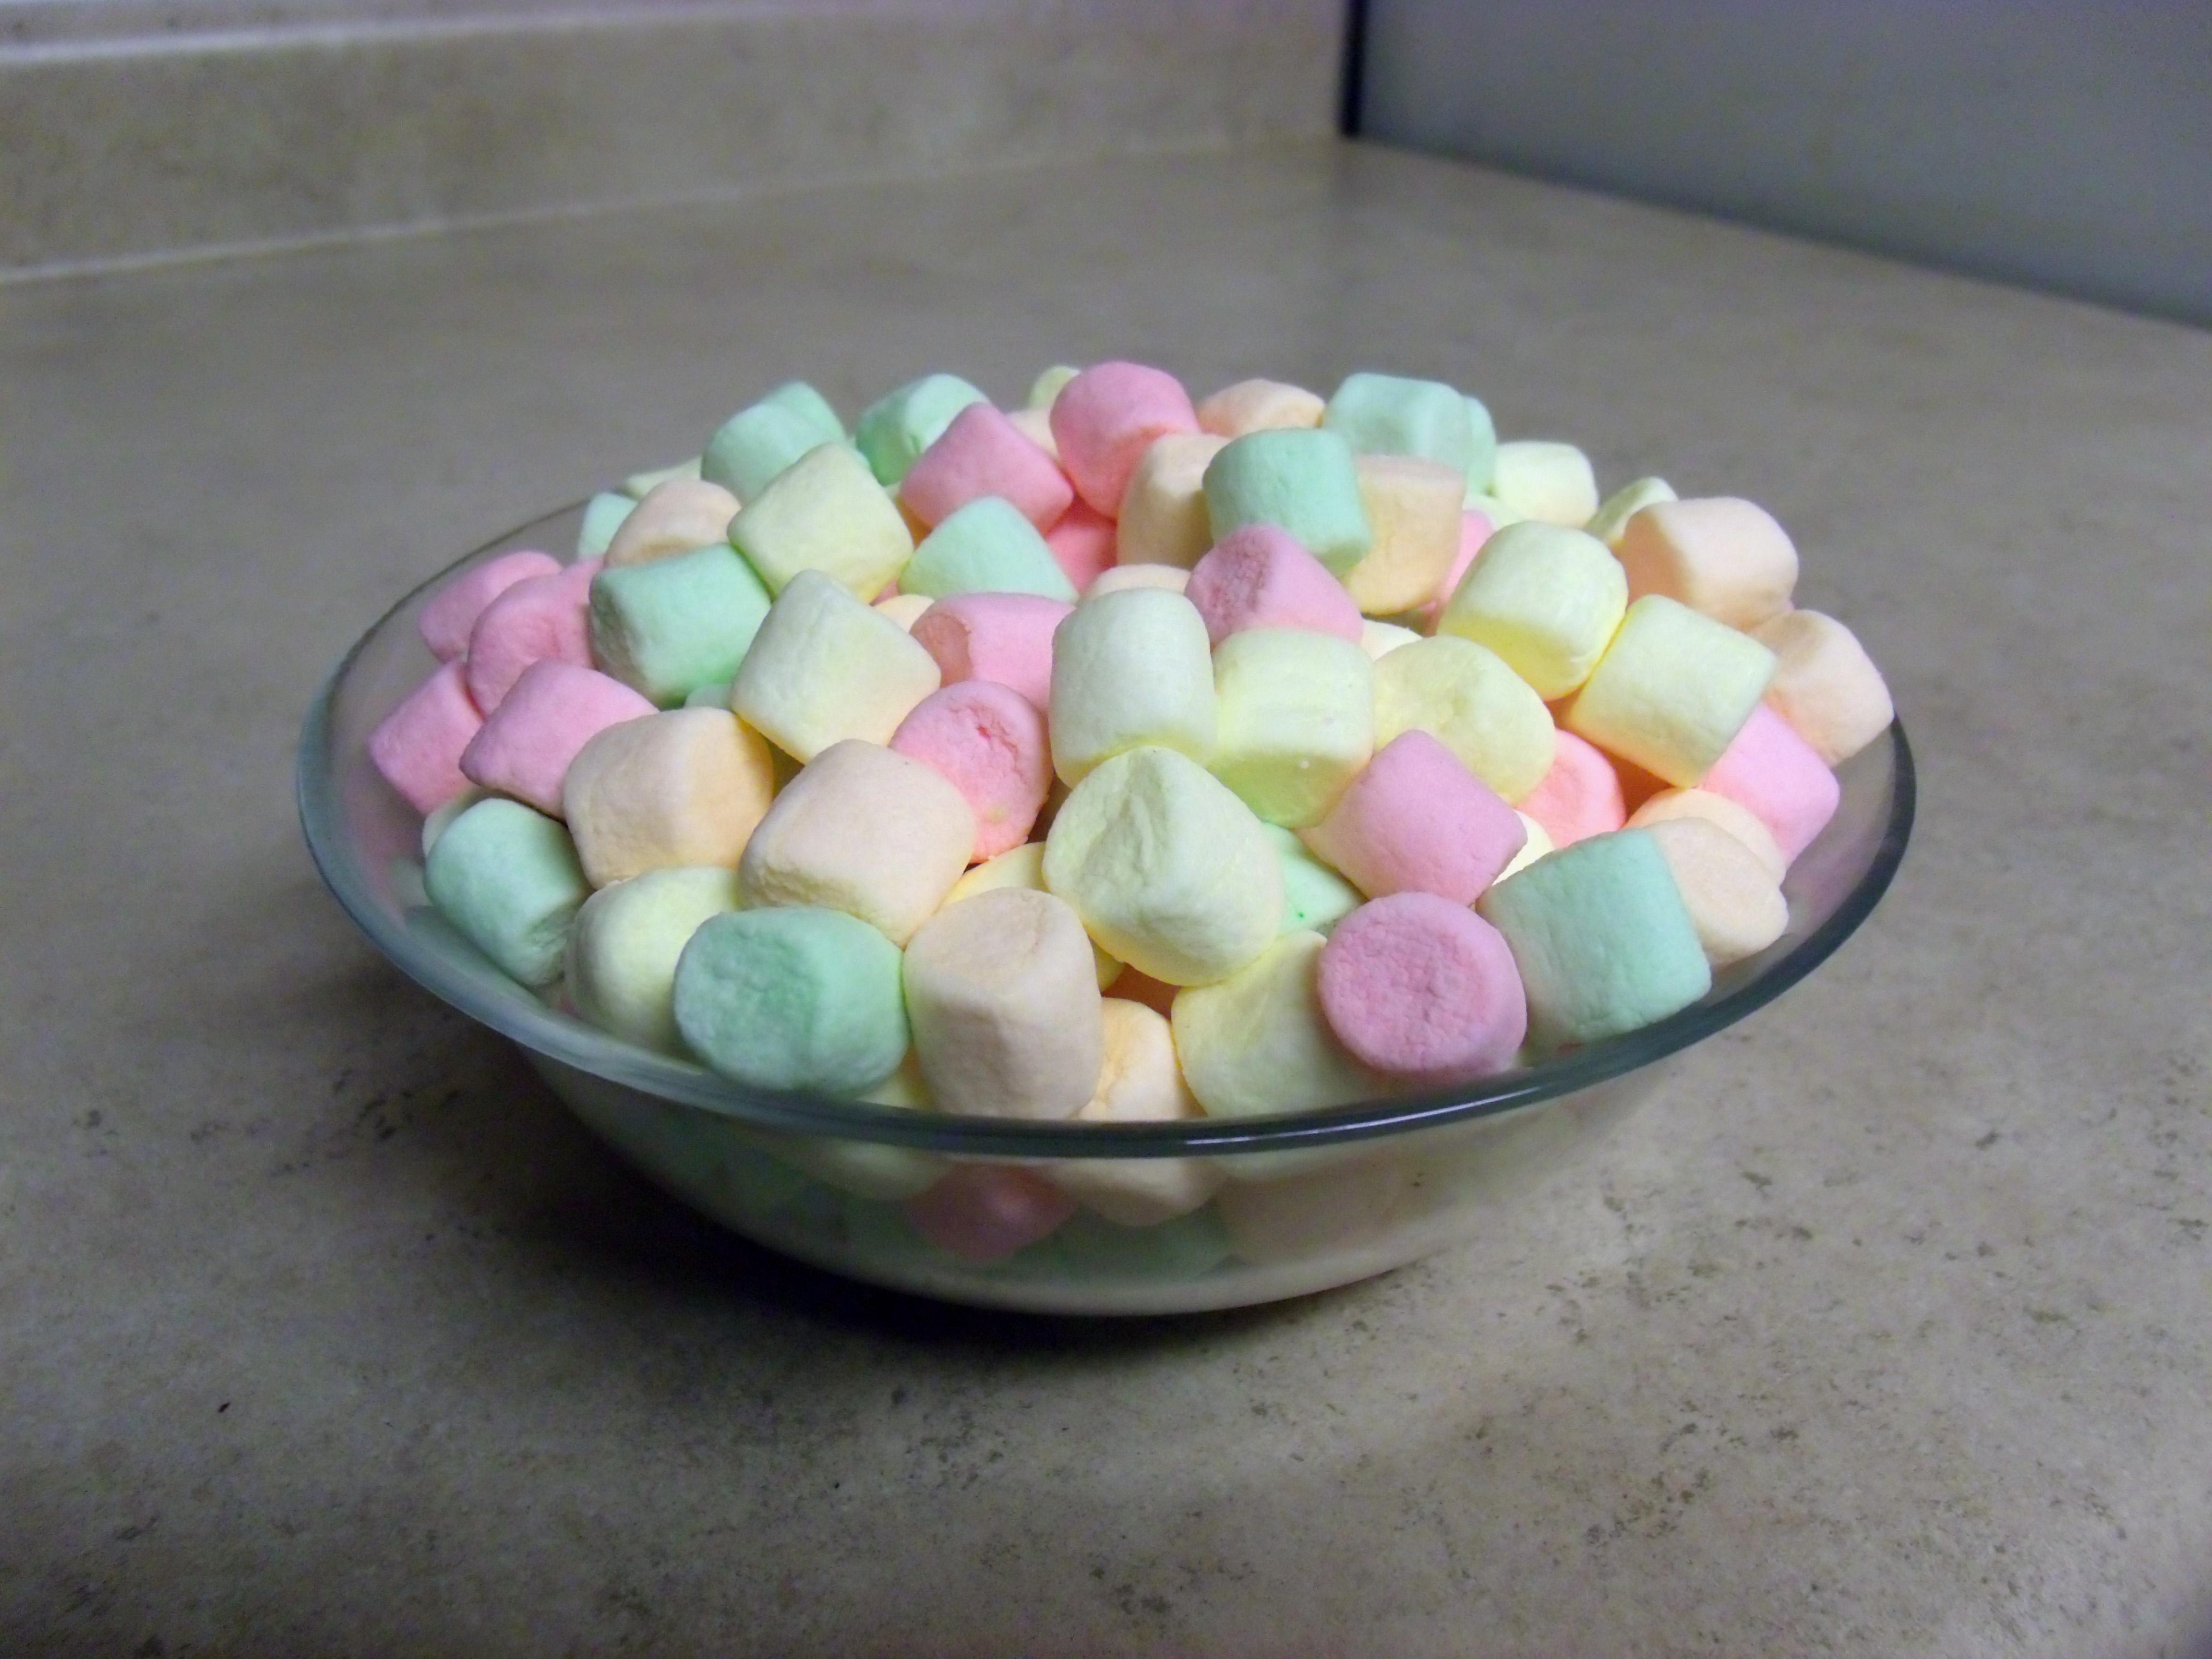 Free Photo Colorful Mini Marshmallows Food Marshmallow Candy Hq